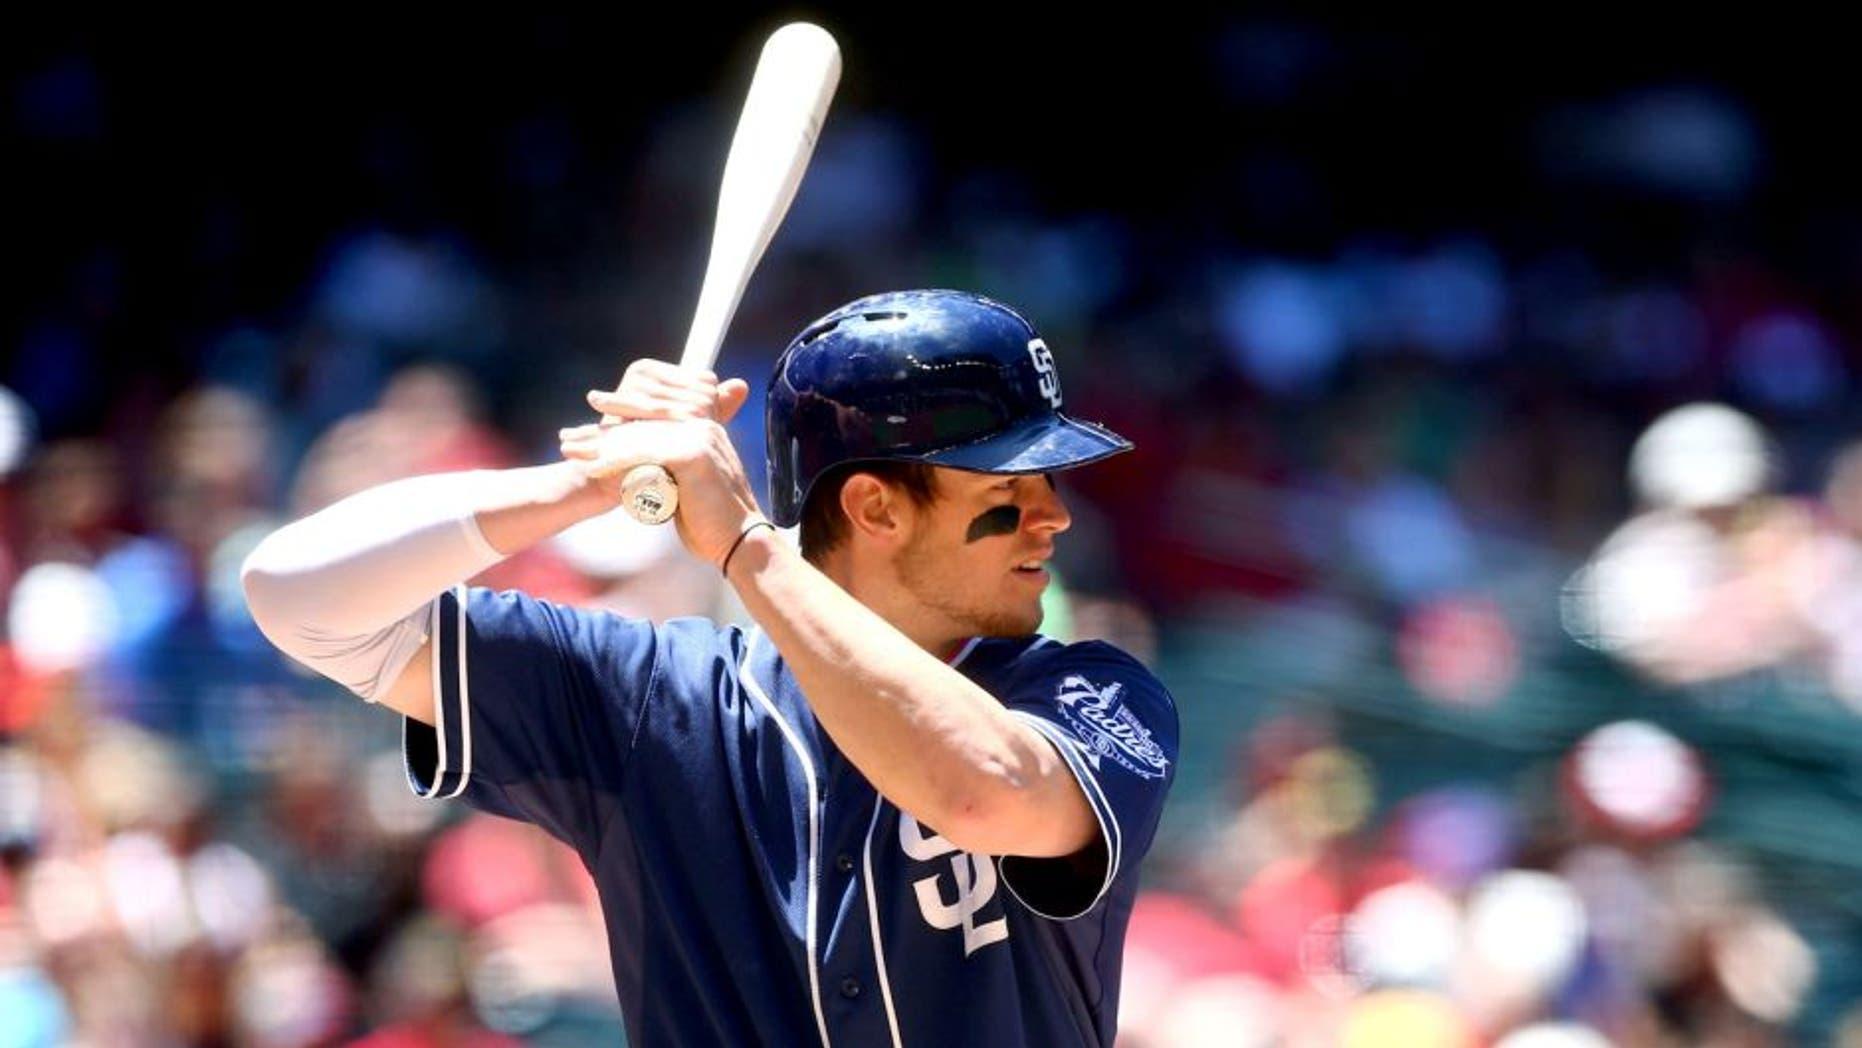 May 10, 2015; Phoenix, AZ, USA; San Diego Padres first baseman Wil Myers against the Arizona Diamondbacks at Chase Field. Mandatory Credit: Mark J. Rebilas-USA TODAY Sports